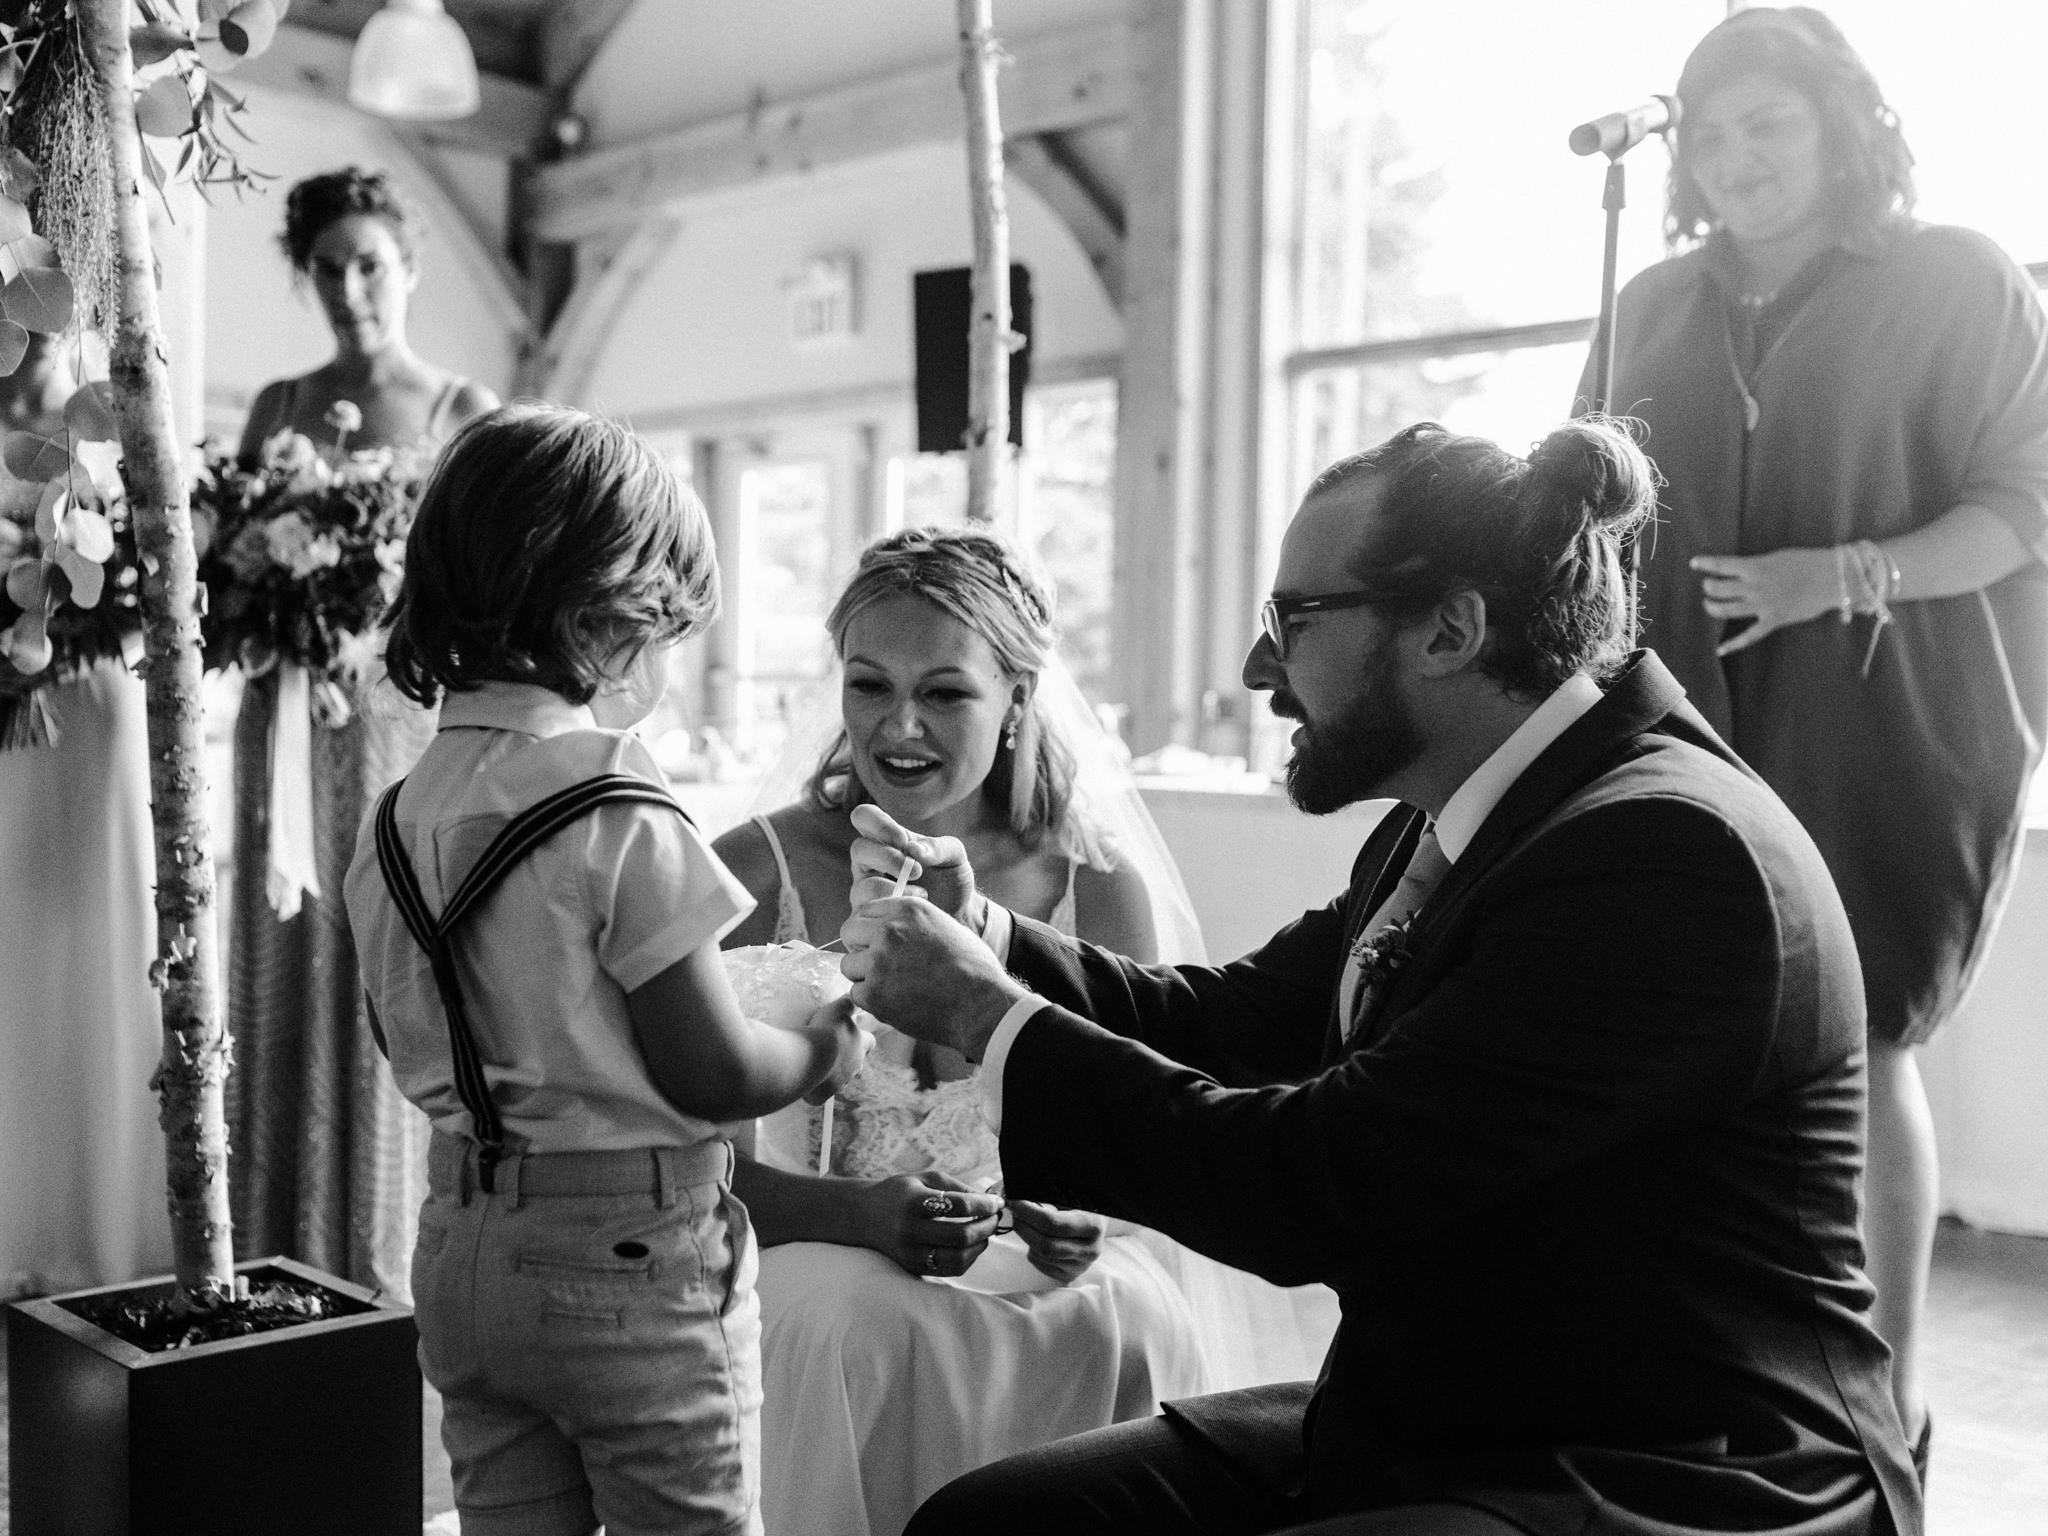 skyloft-wedding-toronto-wedding-photographer-38.jpg